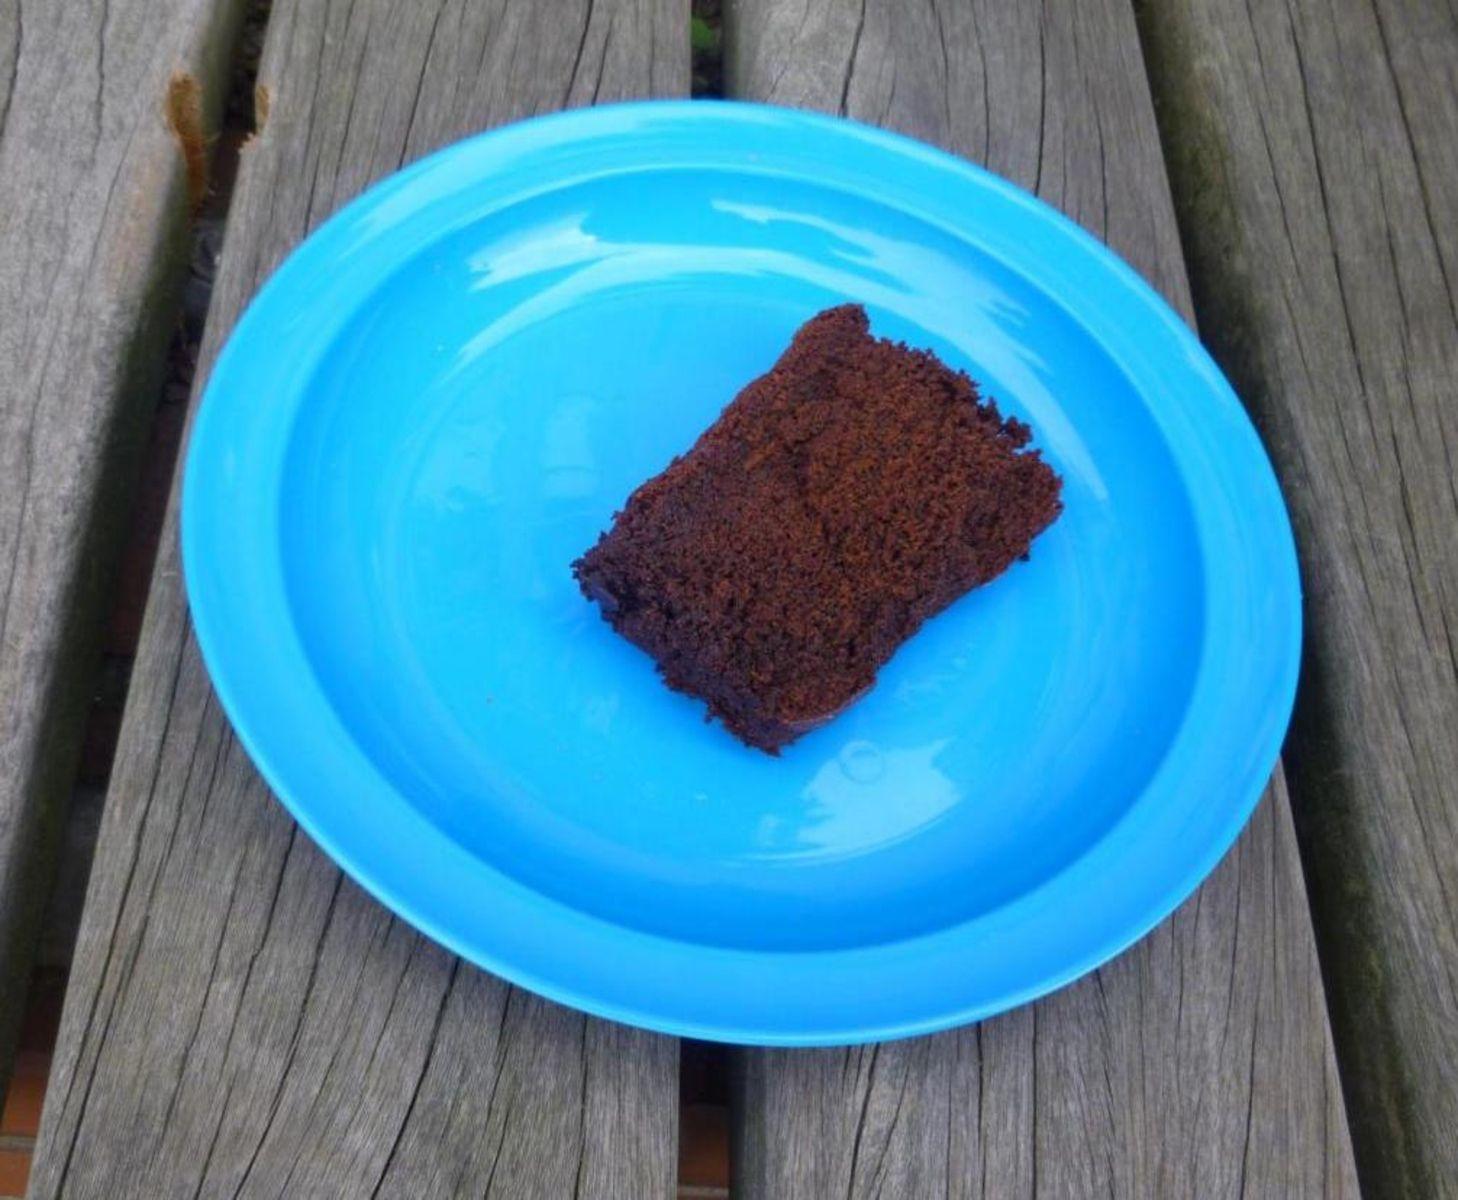 Schokoladenkuchen – extra schokoladig